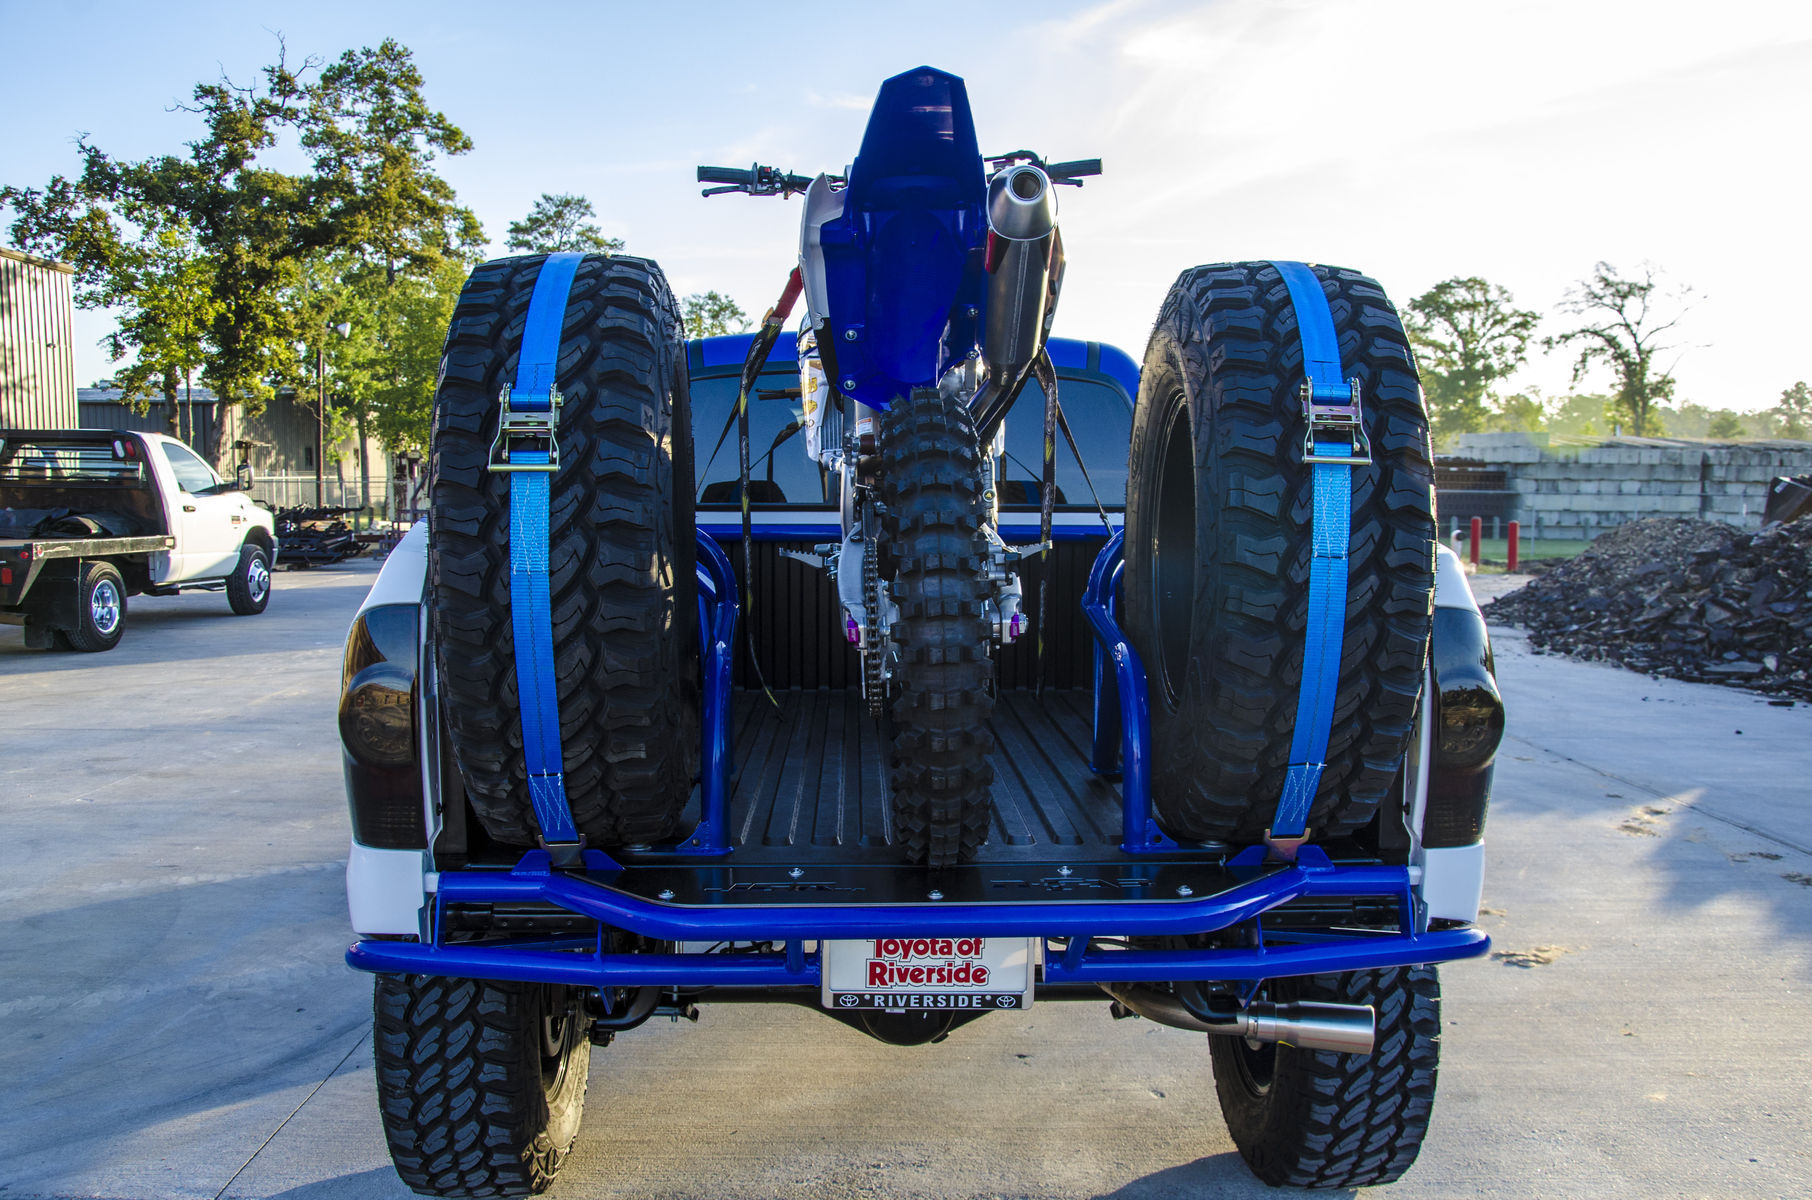 Toyota Tacoma | Justin Barcia's JGR Build - Rear Shot